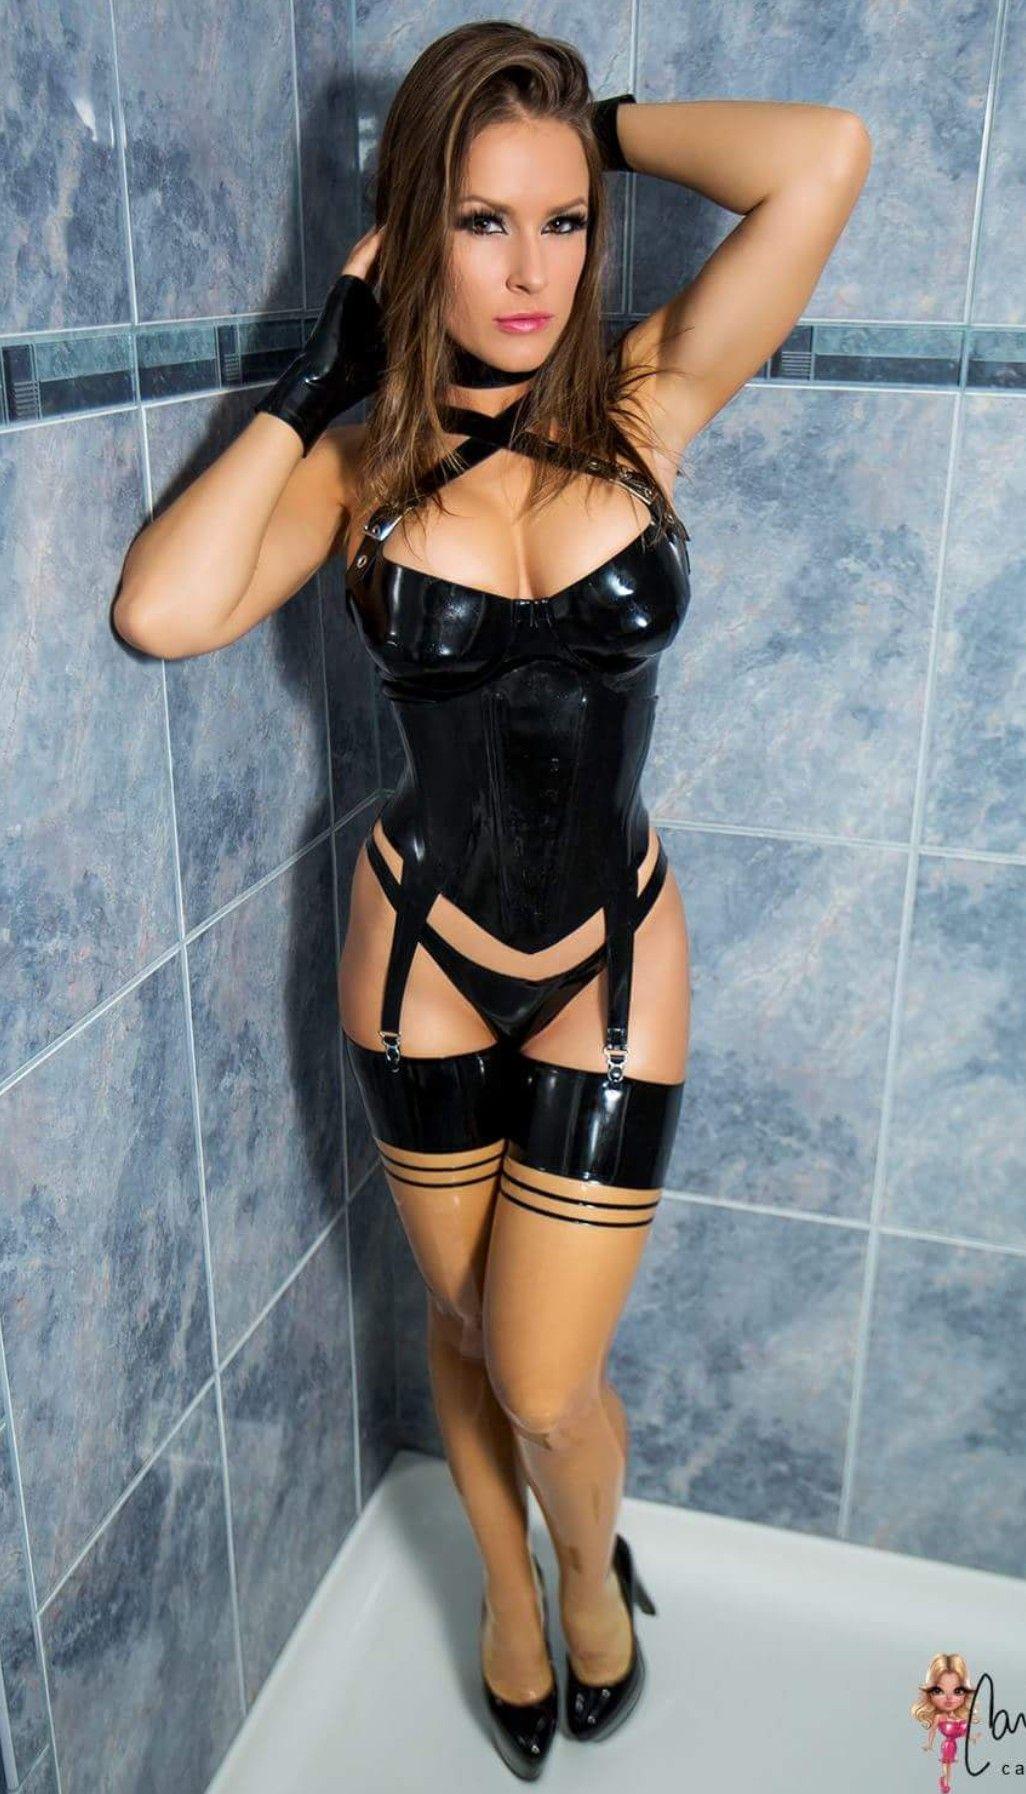 Carrie Lachance Sexy Stockings Fetish Fashion Latex Fashion Latex Lady Latex Girls